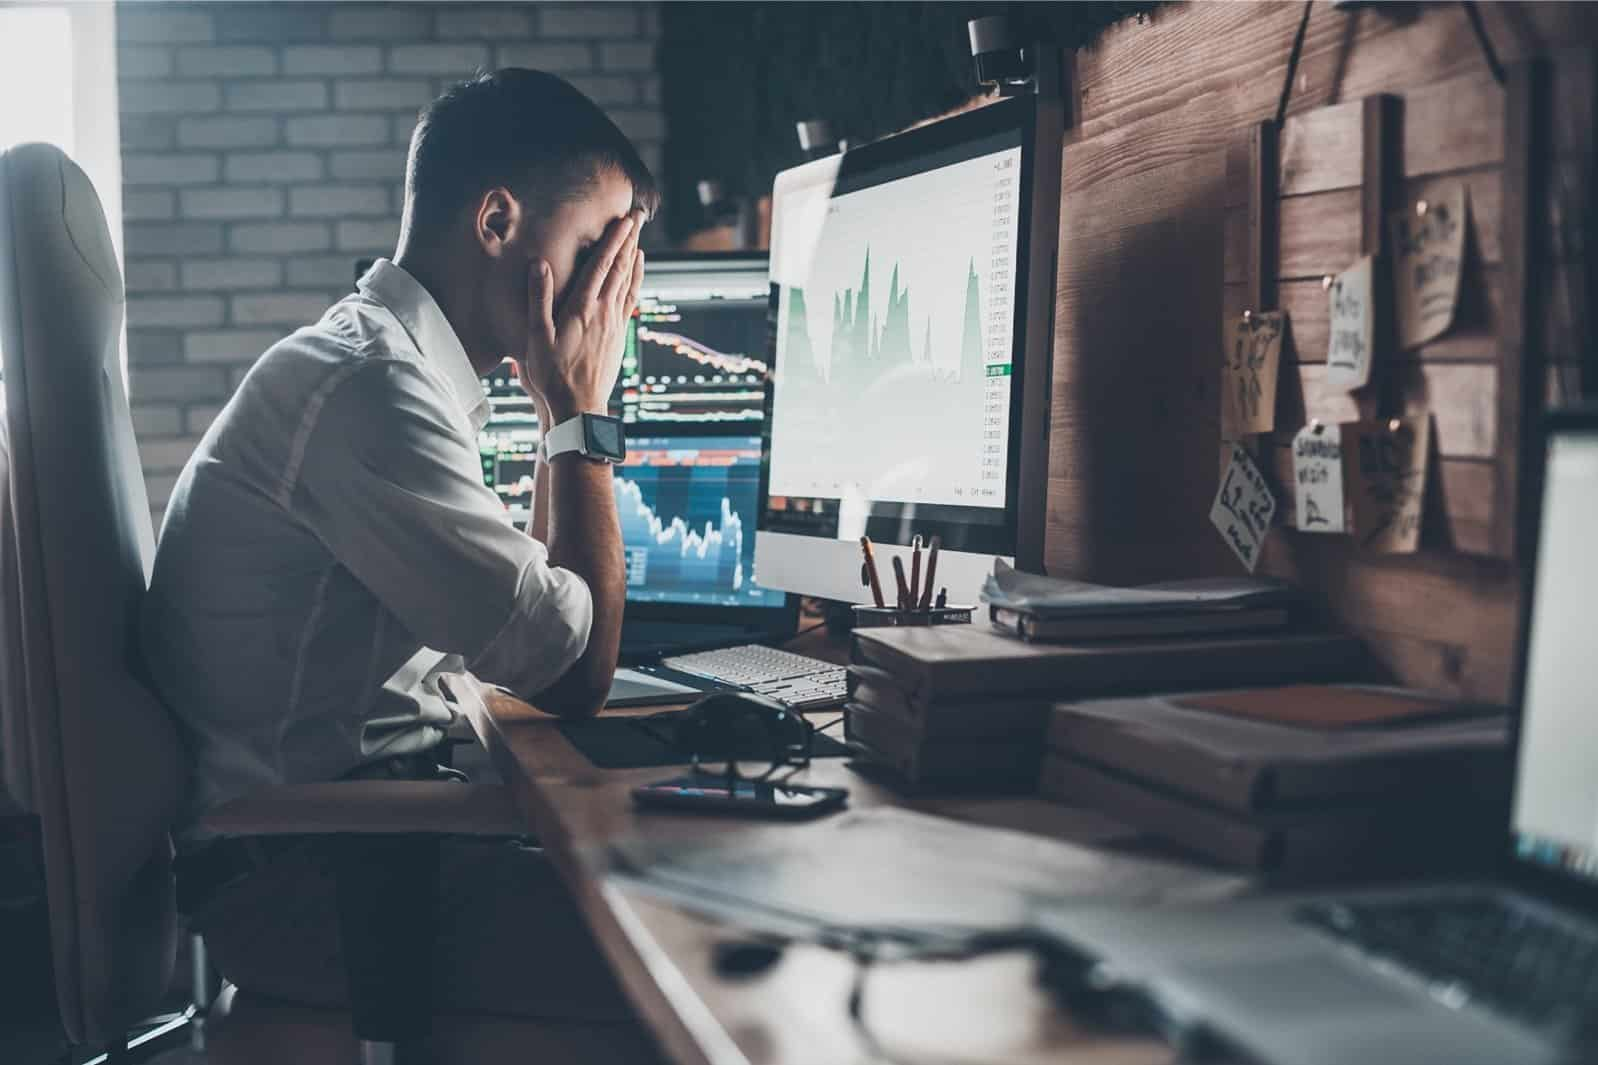 stressed developer due to setbacks